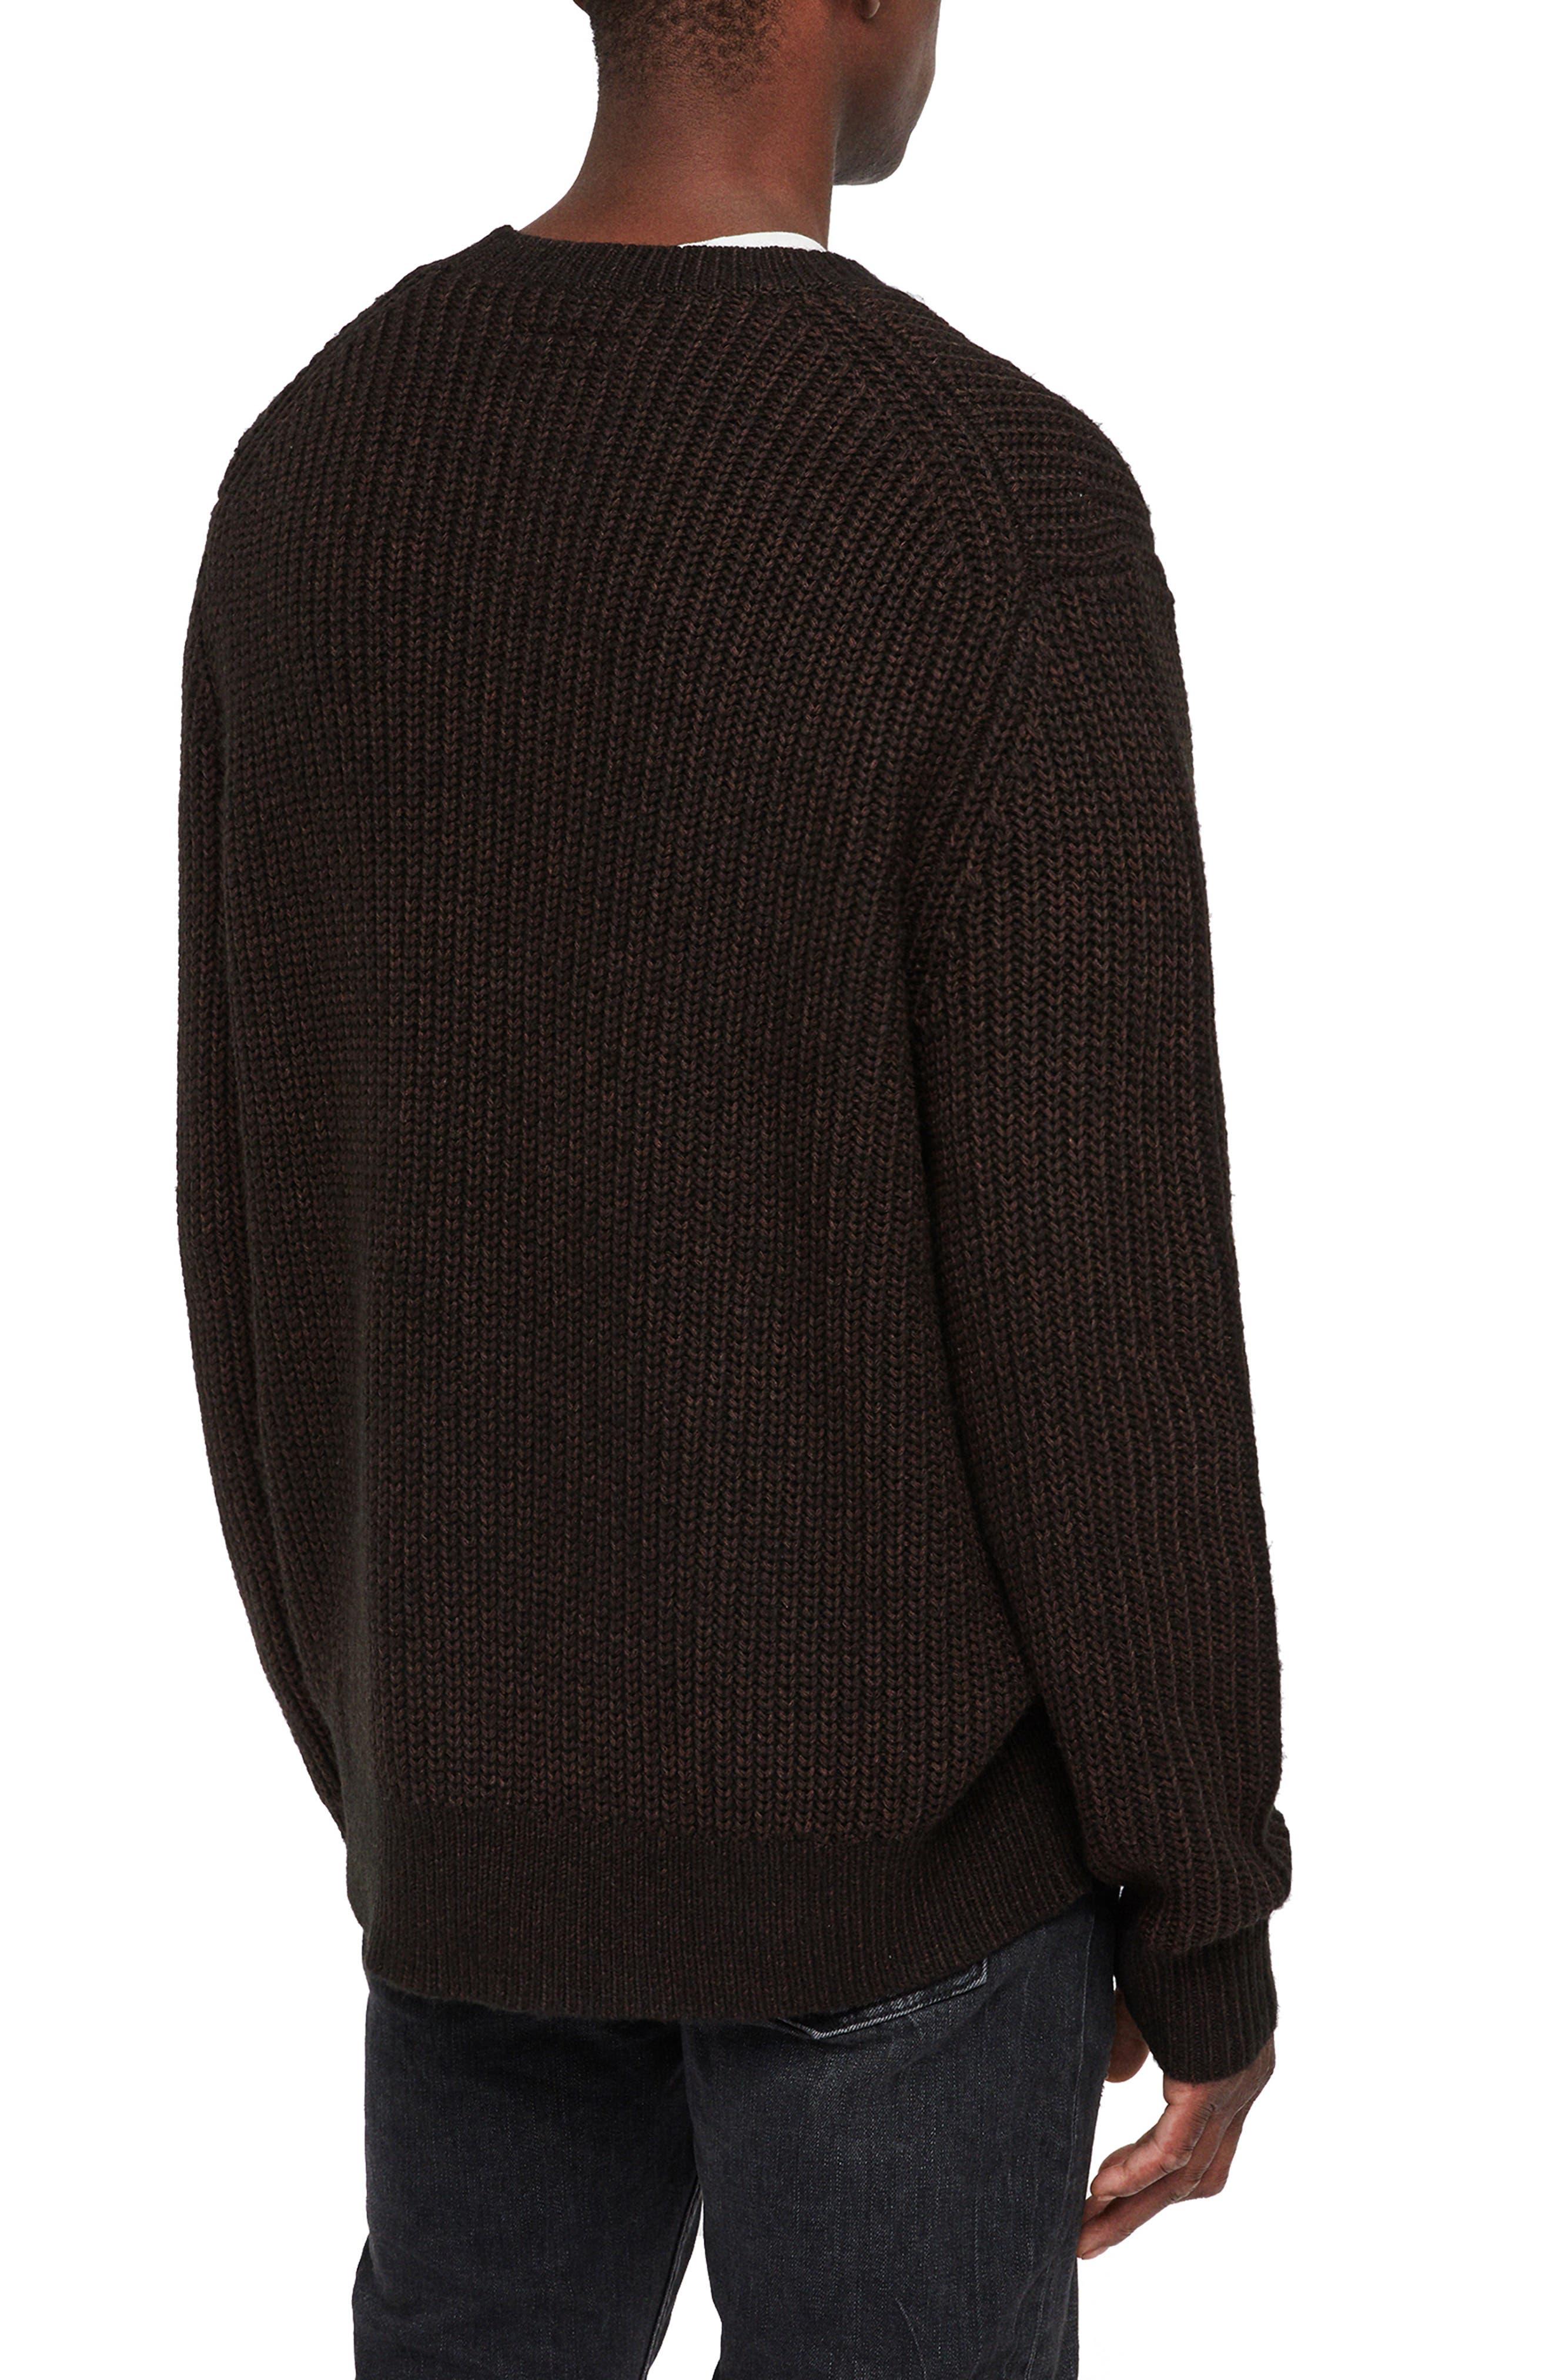 Tilman Regular Fit Sweater,                             Alternate thumbnail 2, color,                             001